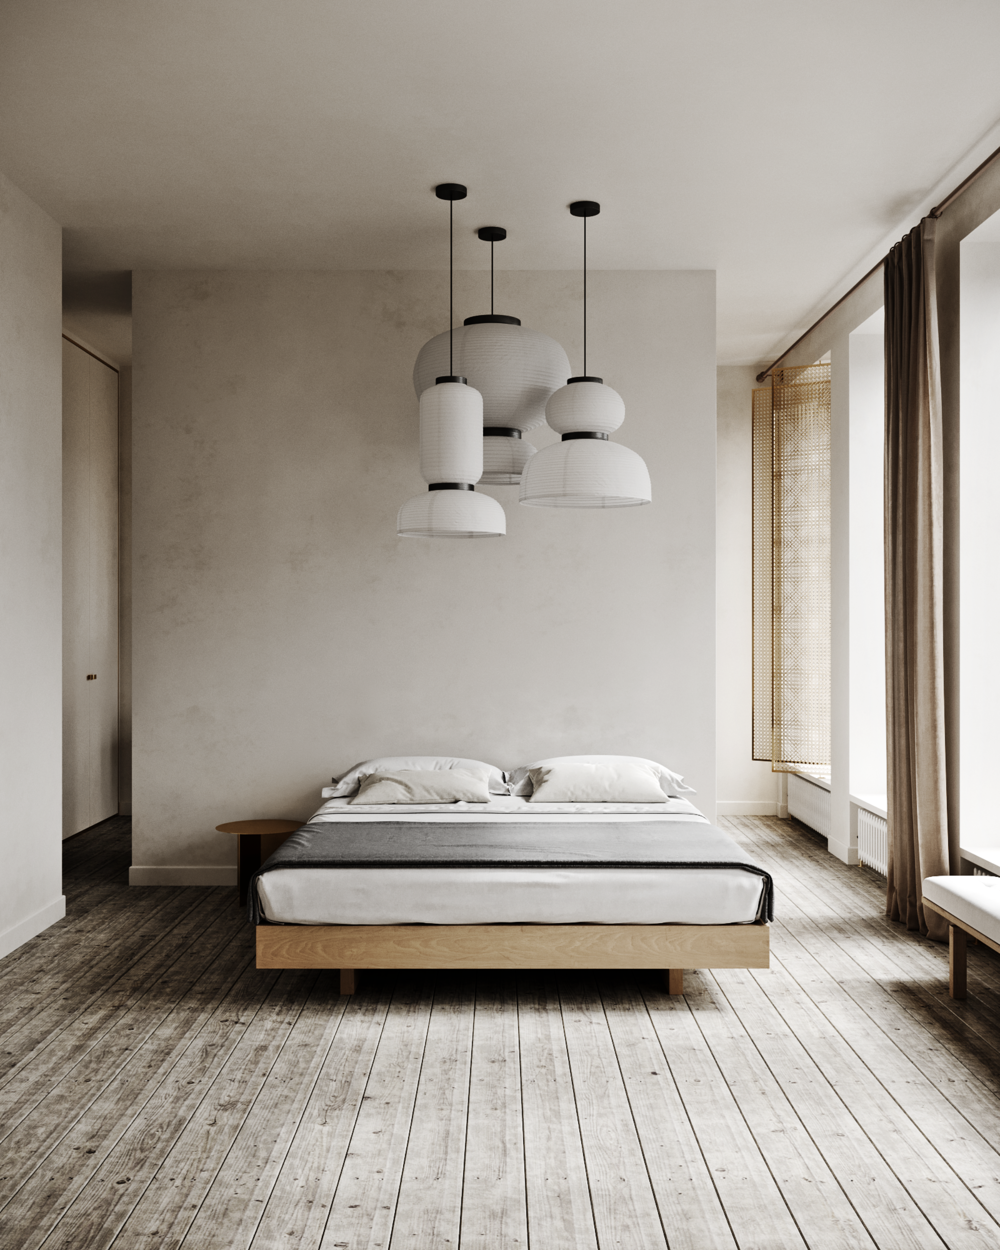 Minimal interiors - by Natalie Dubrovska